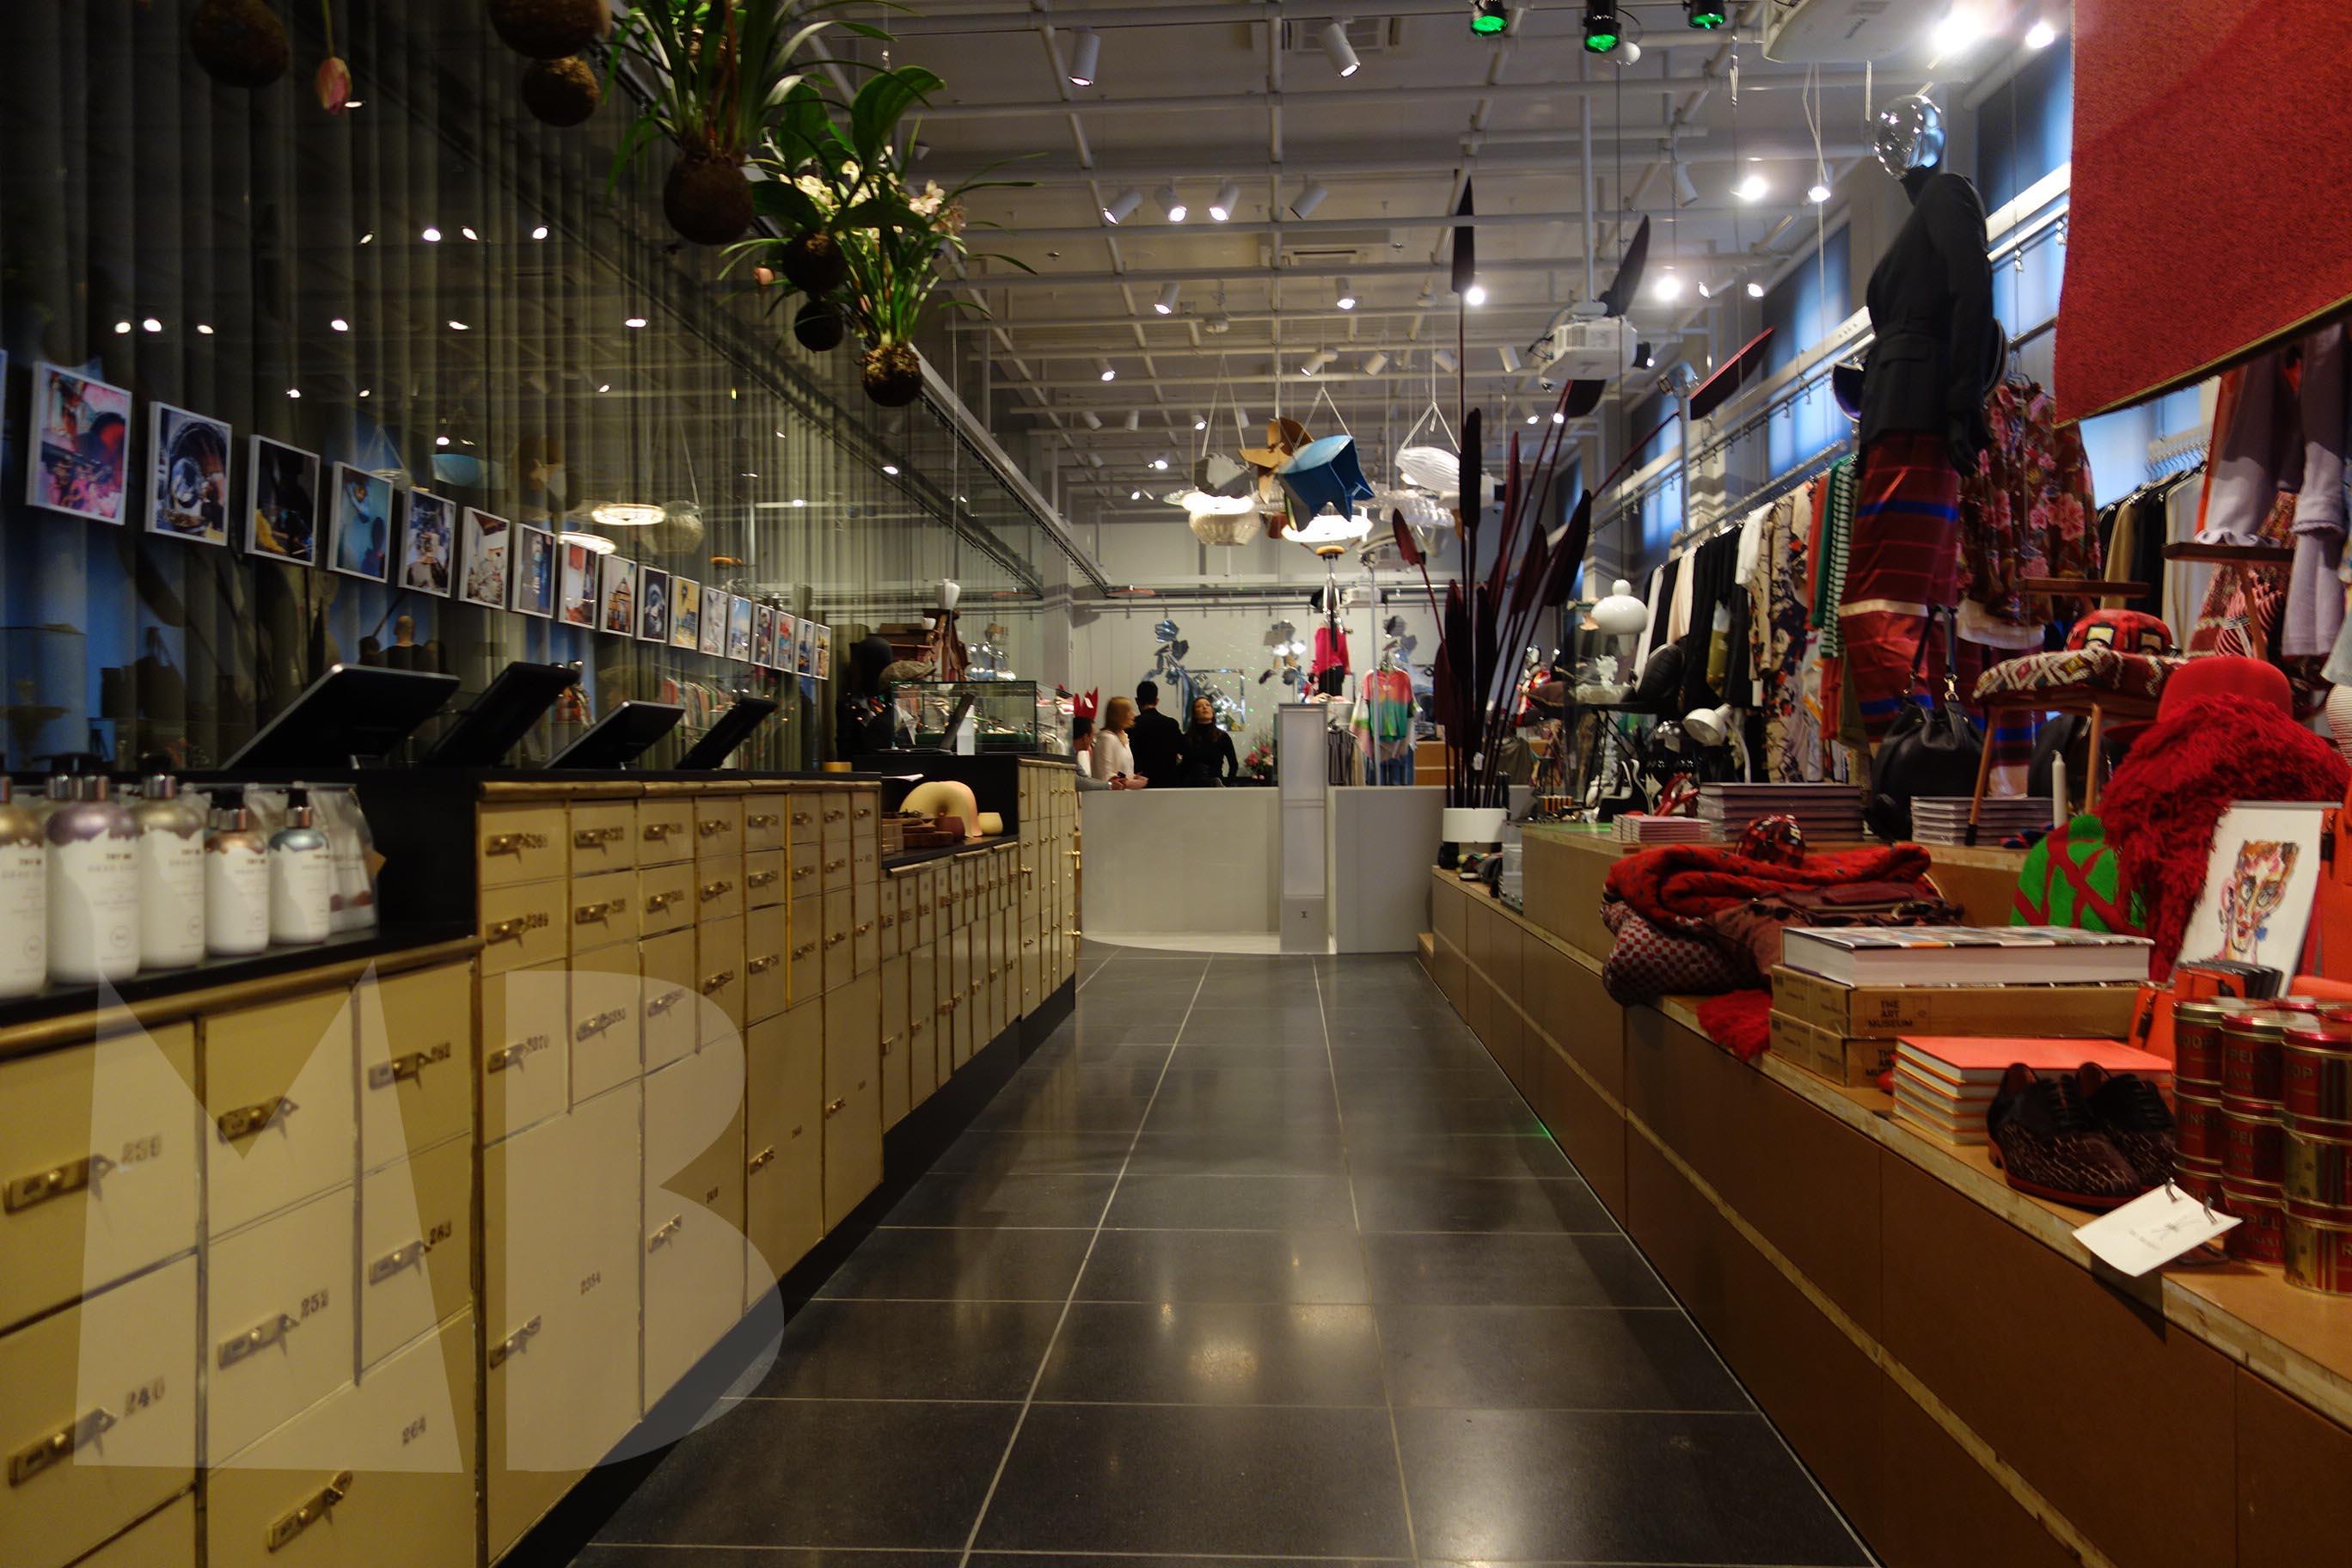 X Bank Amsterdam is Open